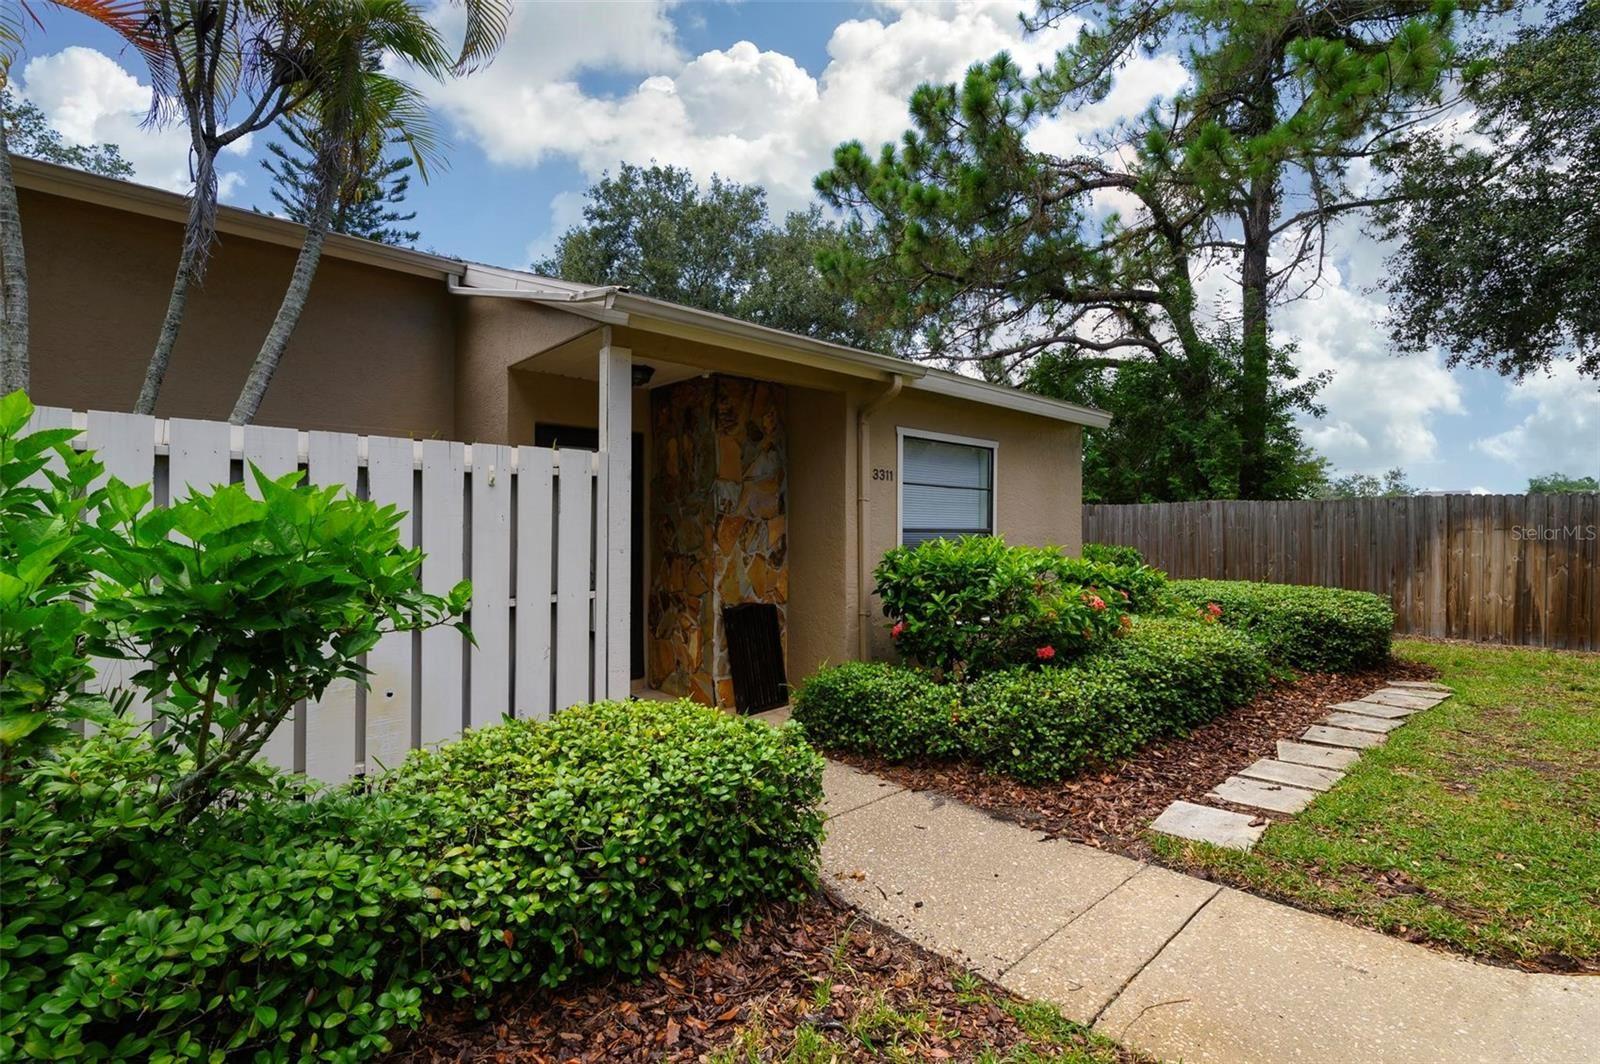 3311 TALLYWOOD COURT #7104, Sarasota, FL 34237 - #: A4507562